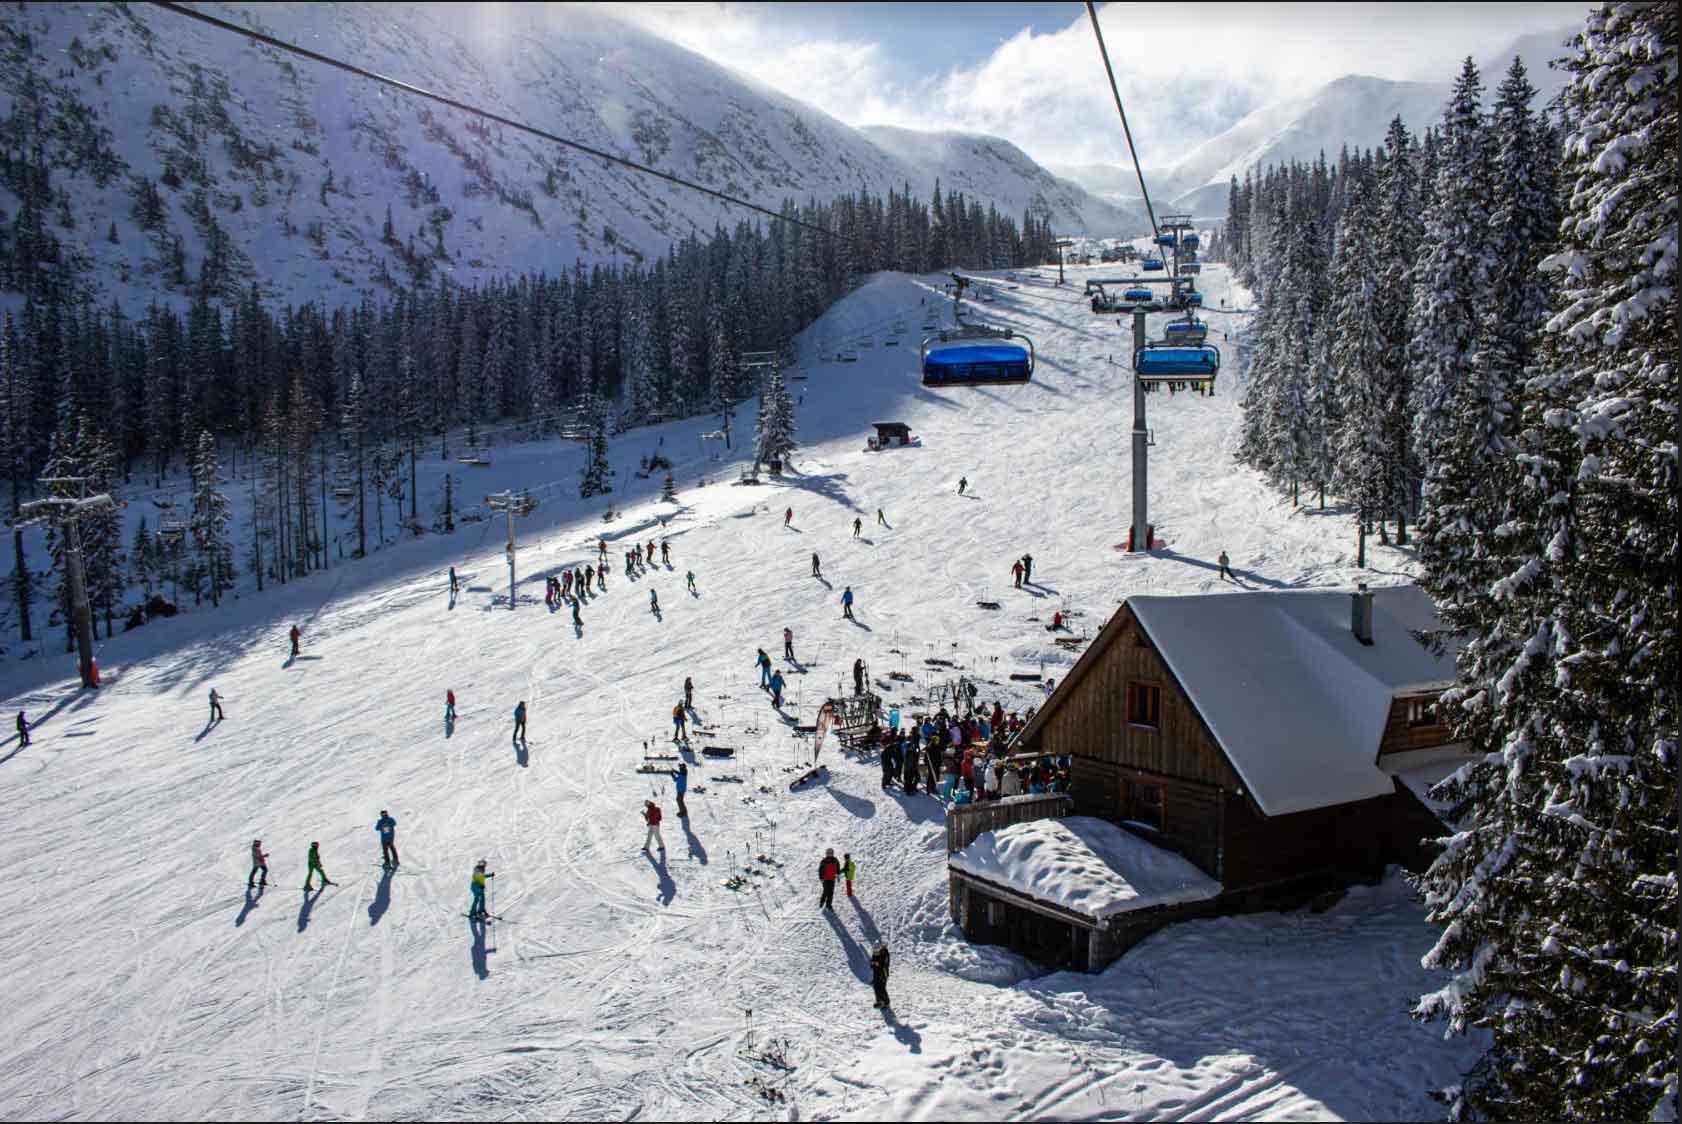 Snow Ski Lift Colorado Backpacker